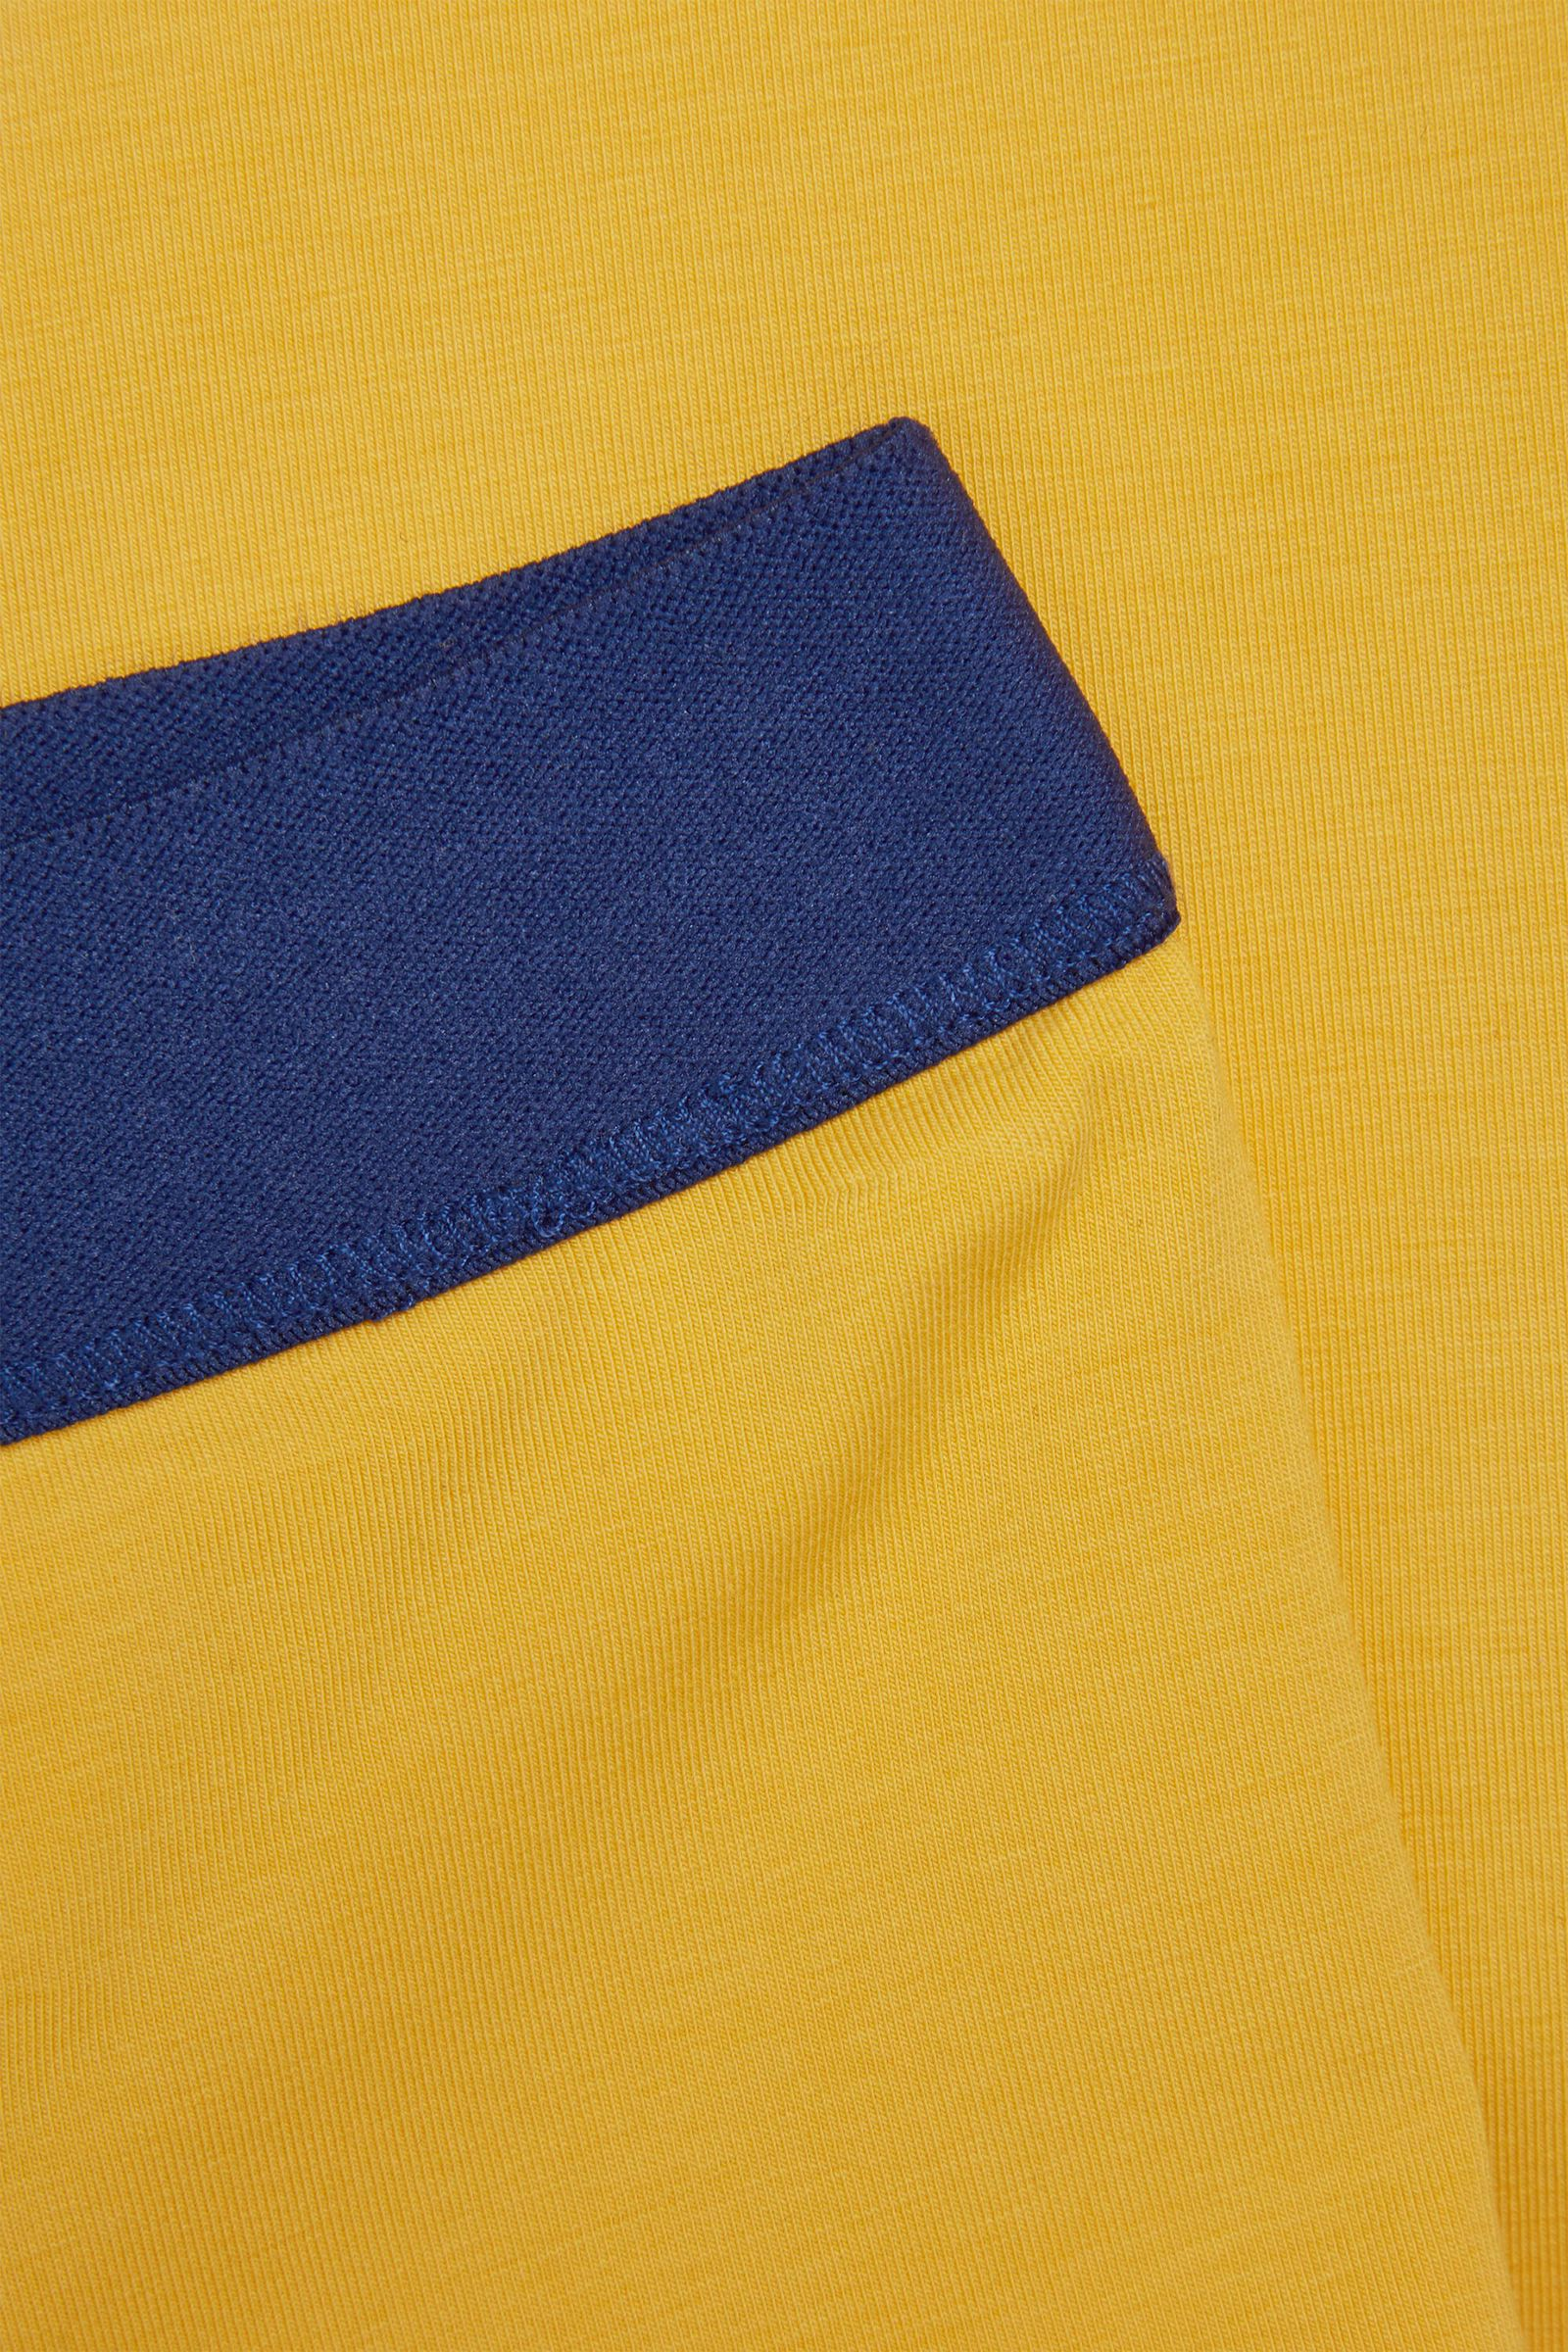 COS 코튼 저지 레깅스의 옐로우 / 네이비컬러 Detail입니다.